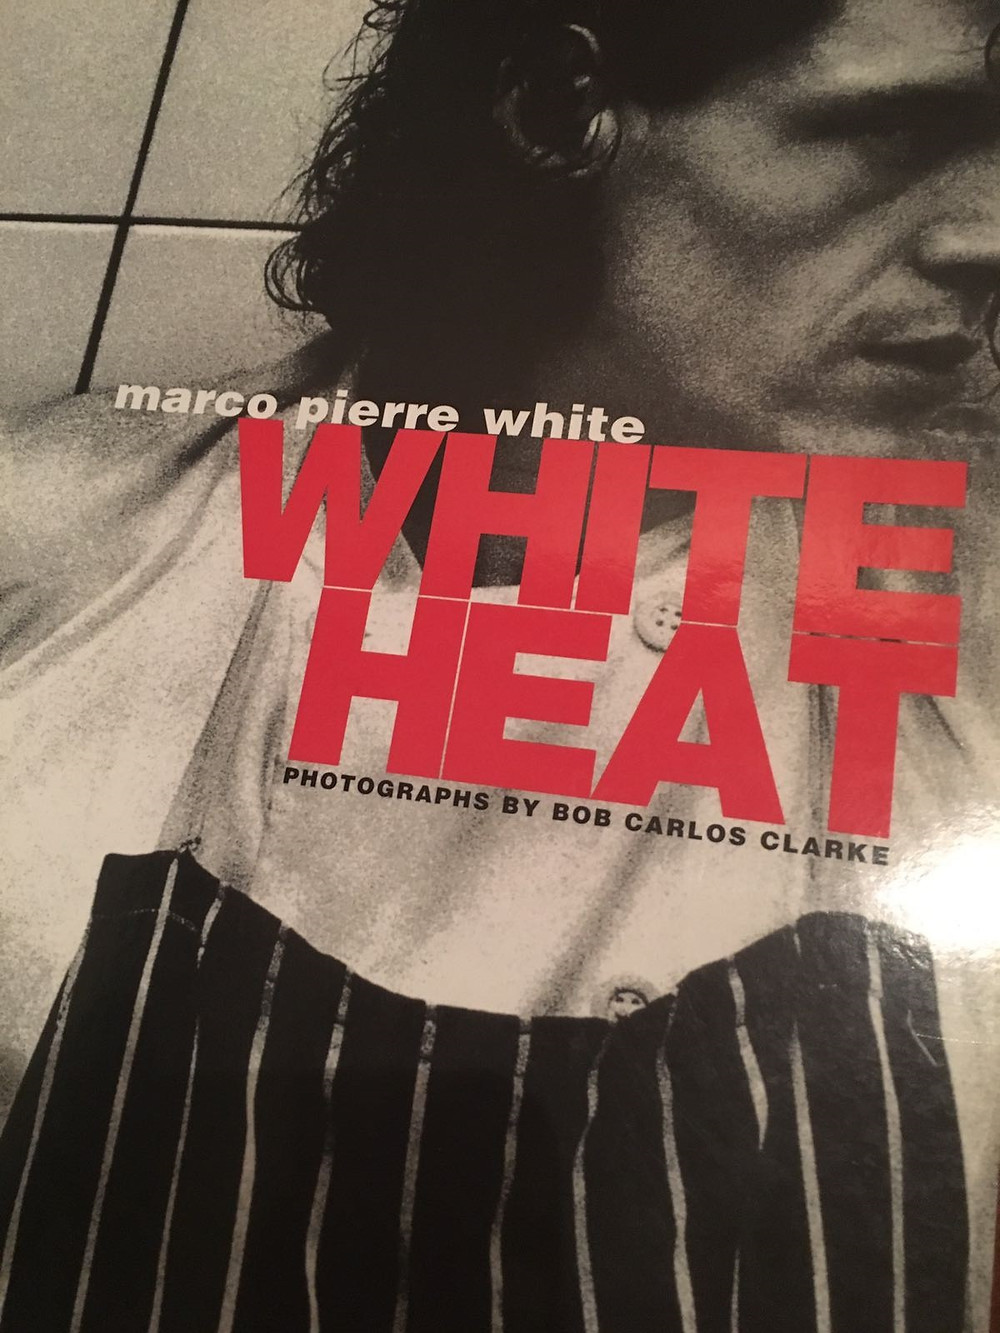 Marco Pierre White - White Heat book